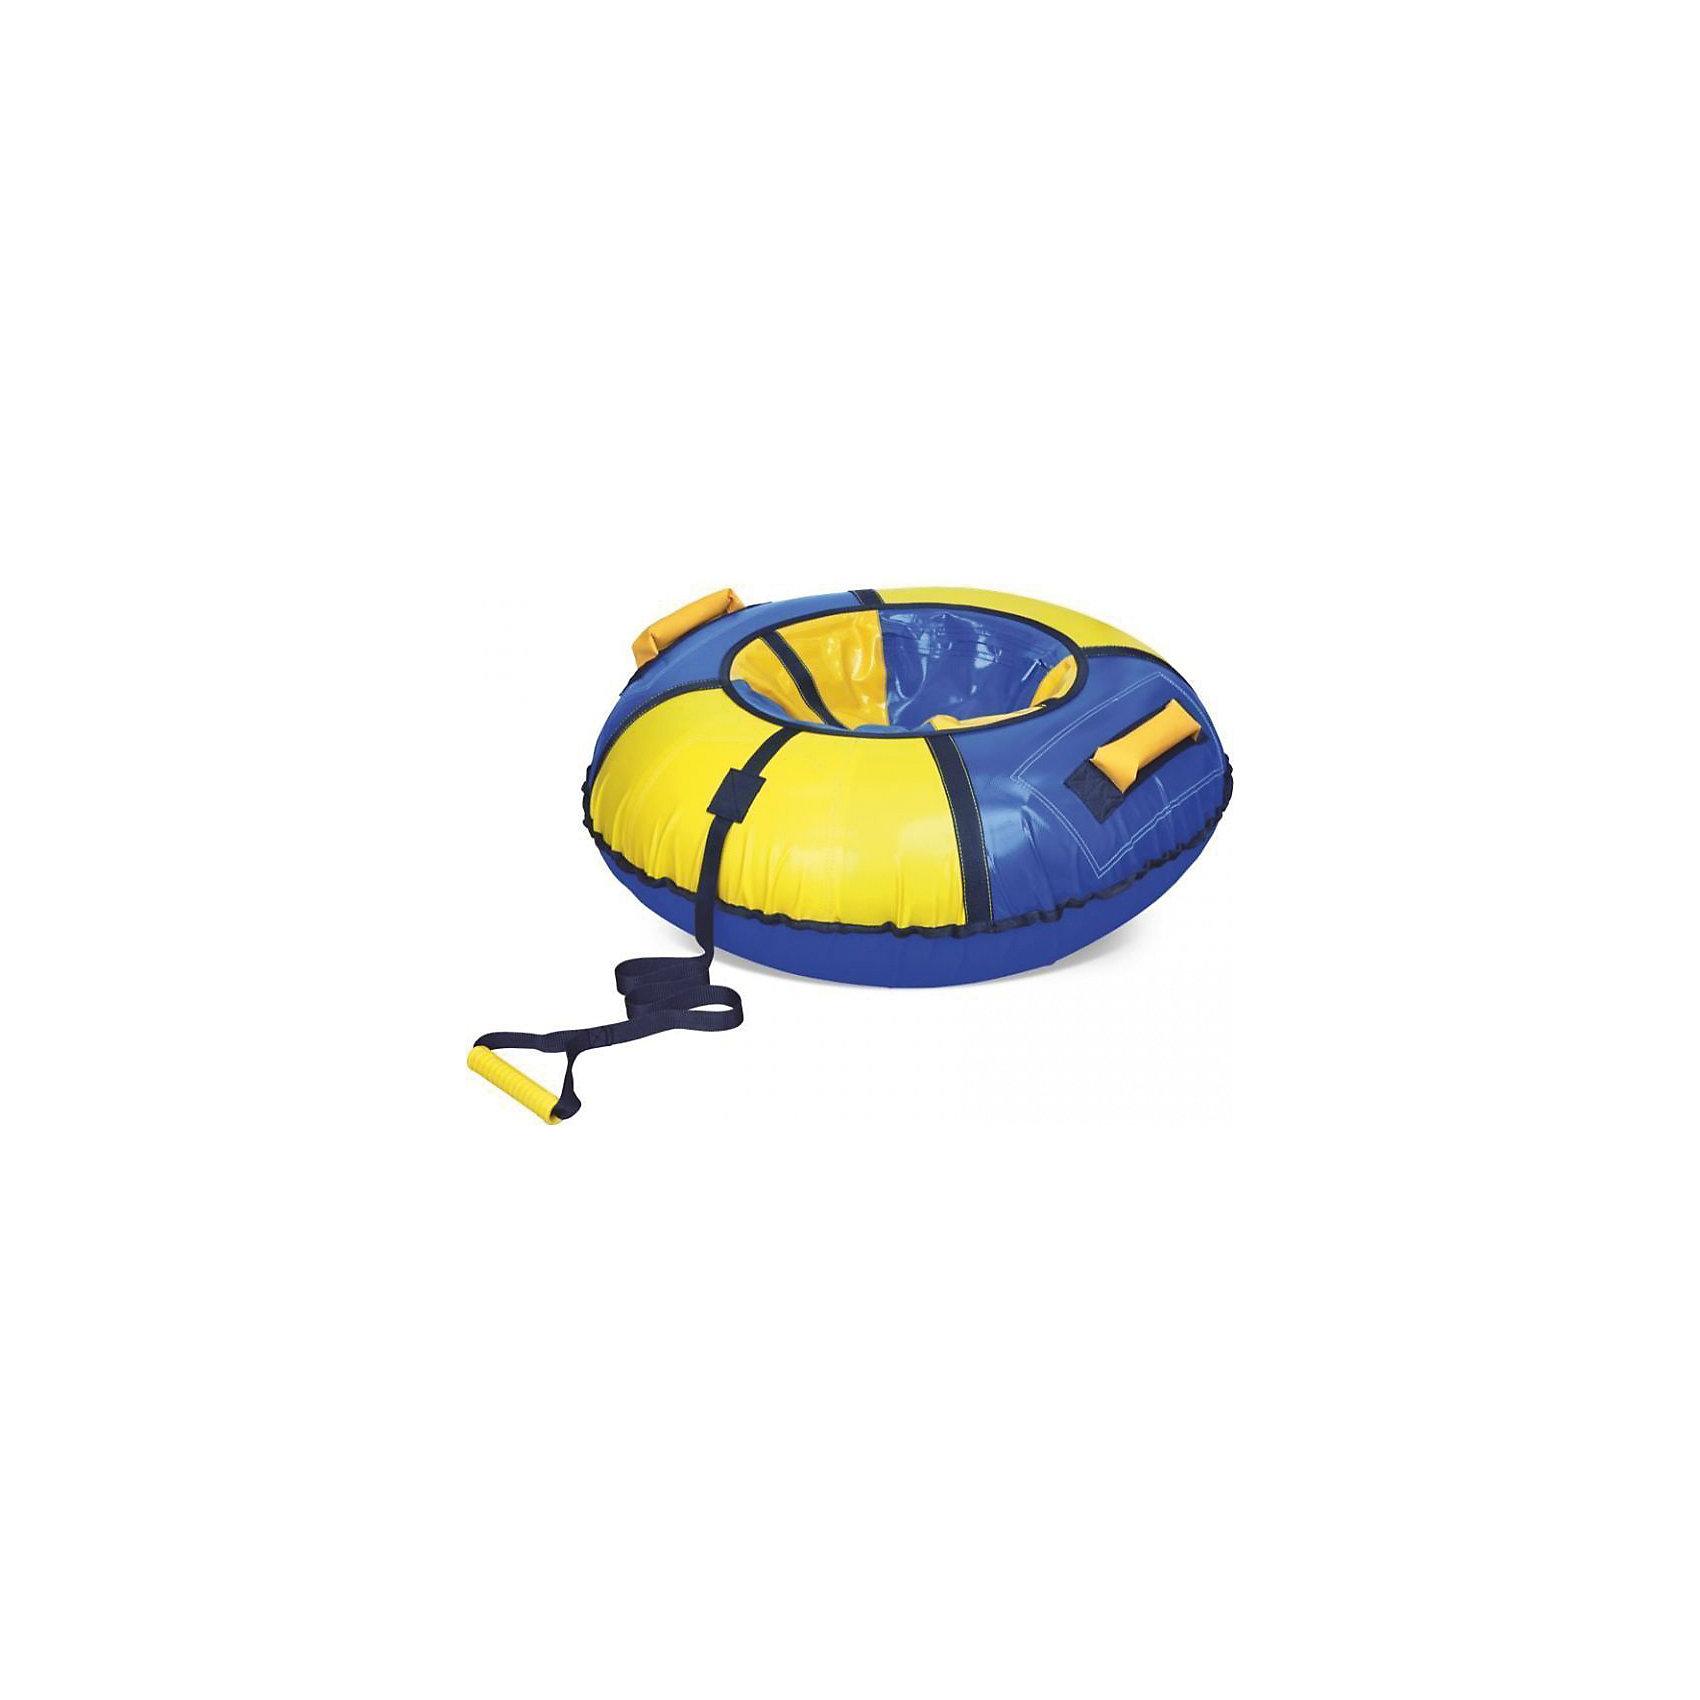 Ника Тюбинг, син/желт, Nika мяч волейбольный atemi space бел желт син